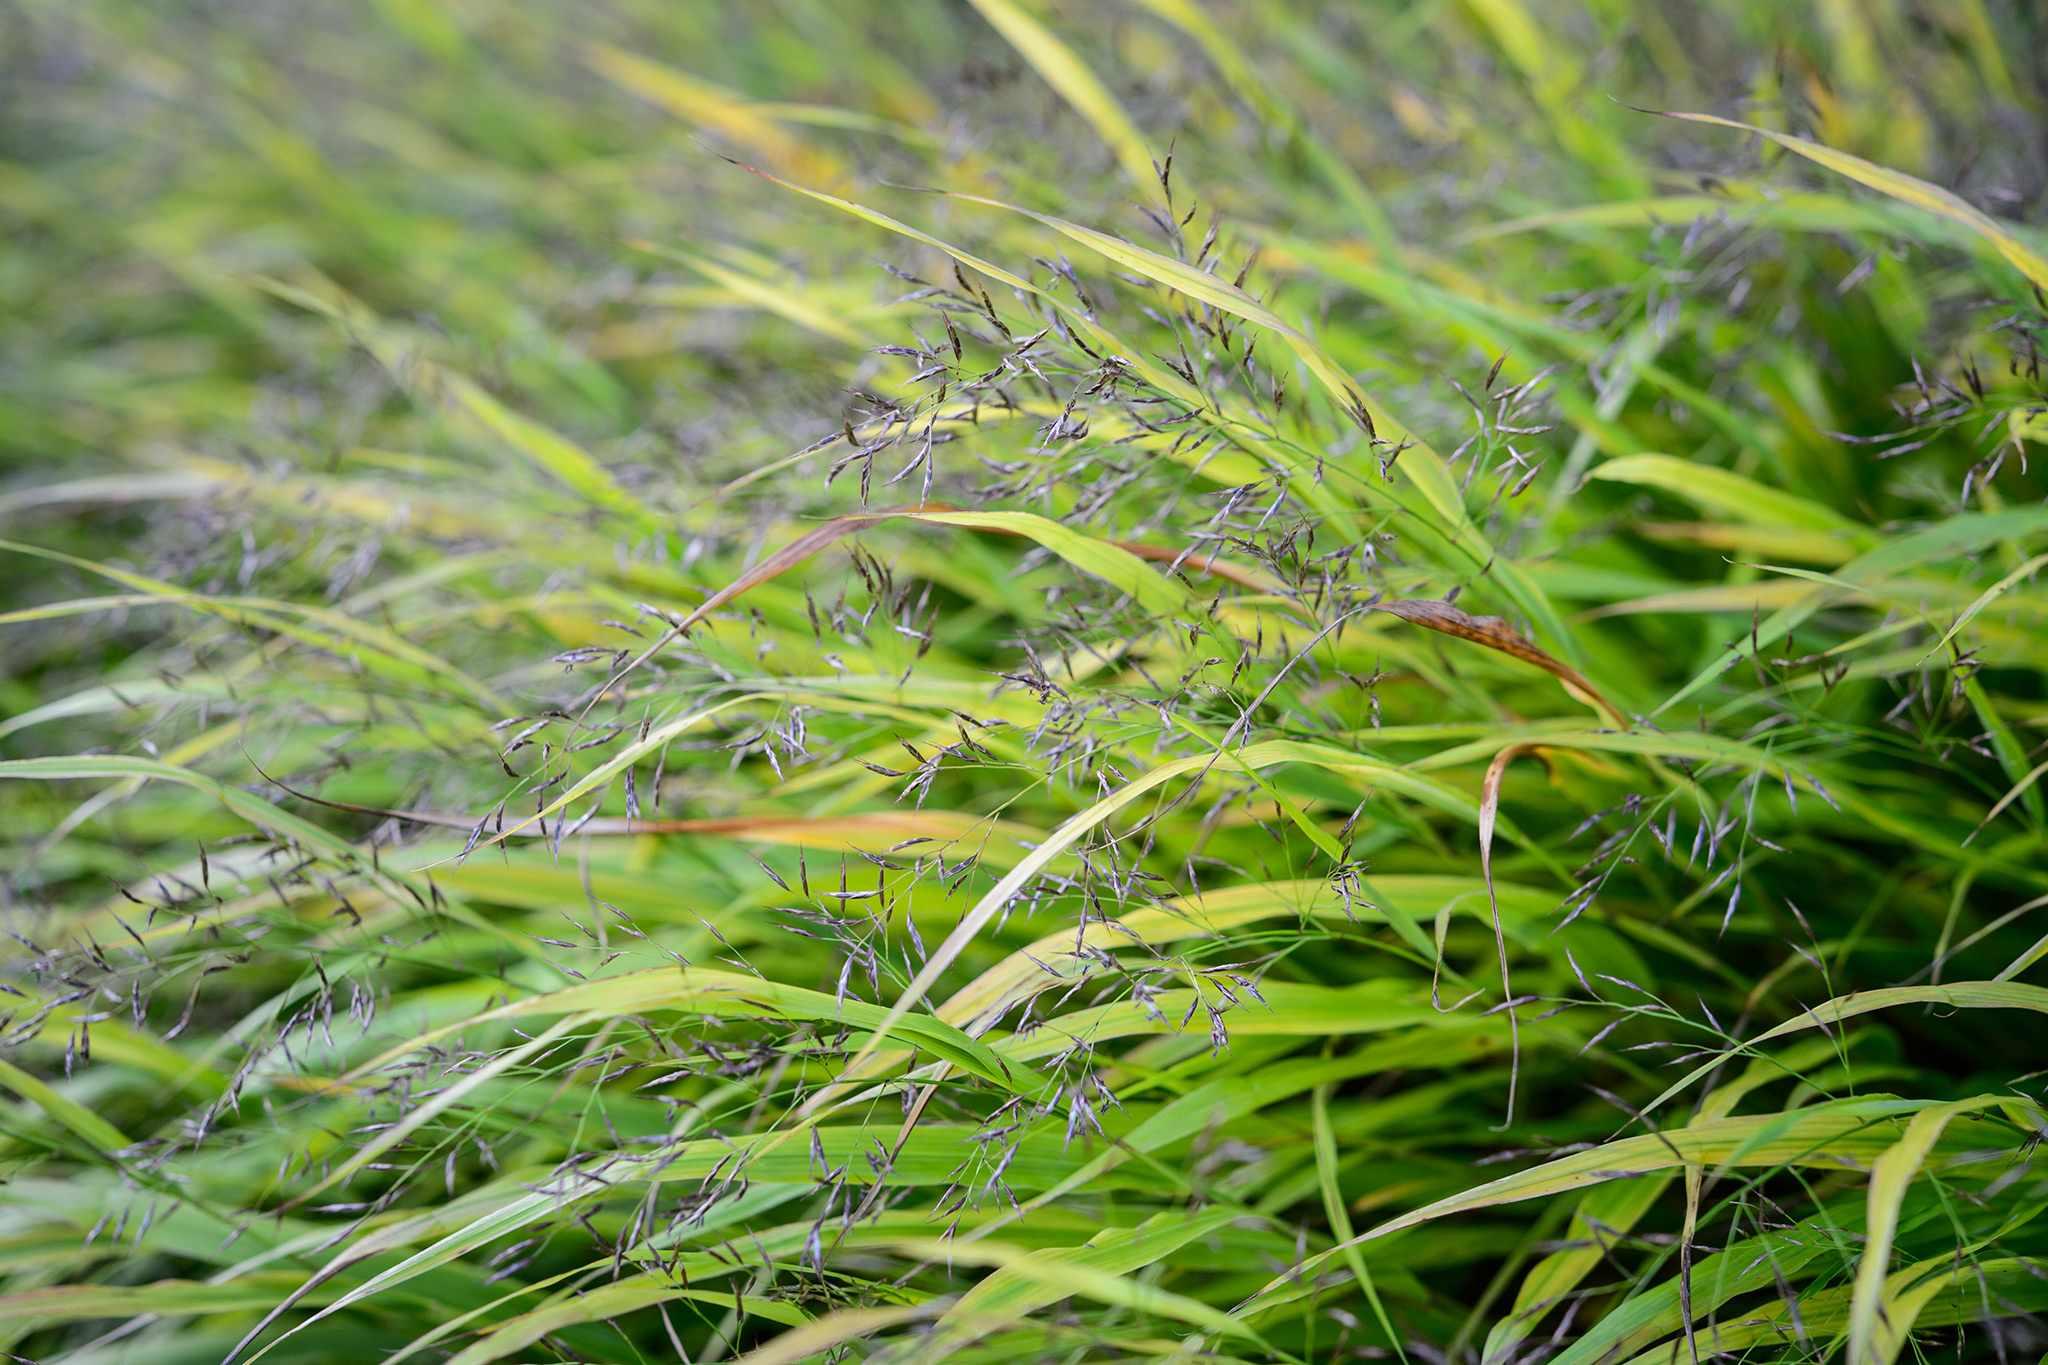 Lush foliage and delicate flowers of grass Hakonechloa macra